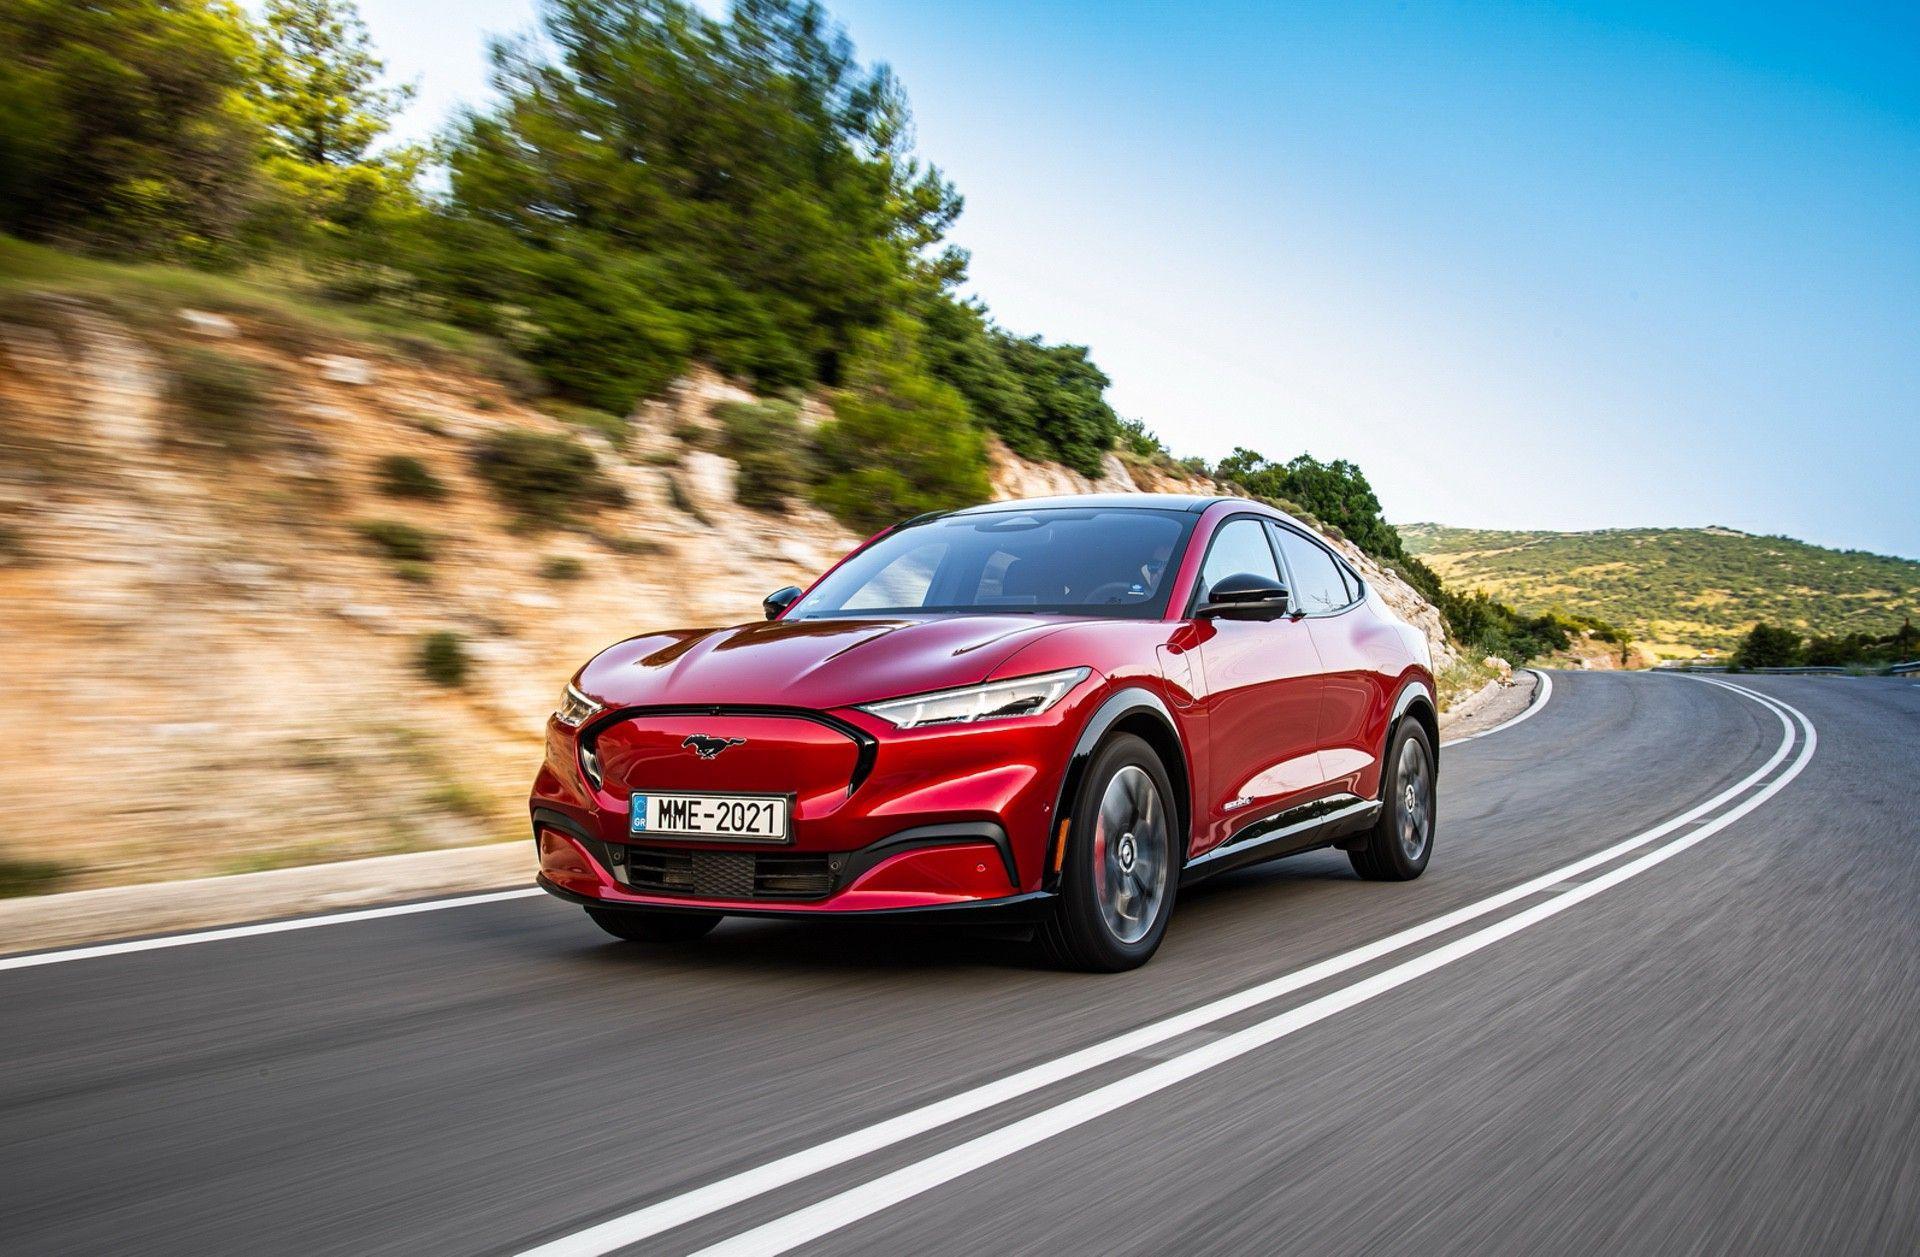 Ford_Mustang_Mach-E_greek_presskit-0129